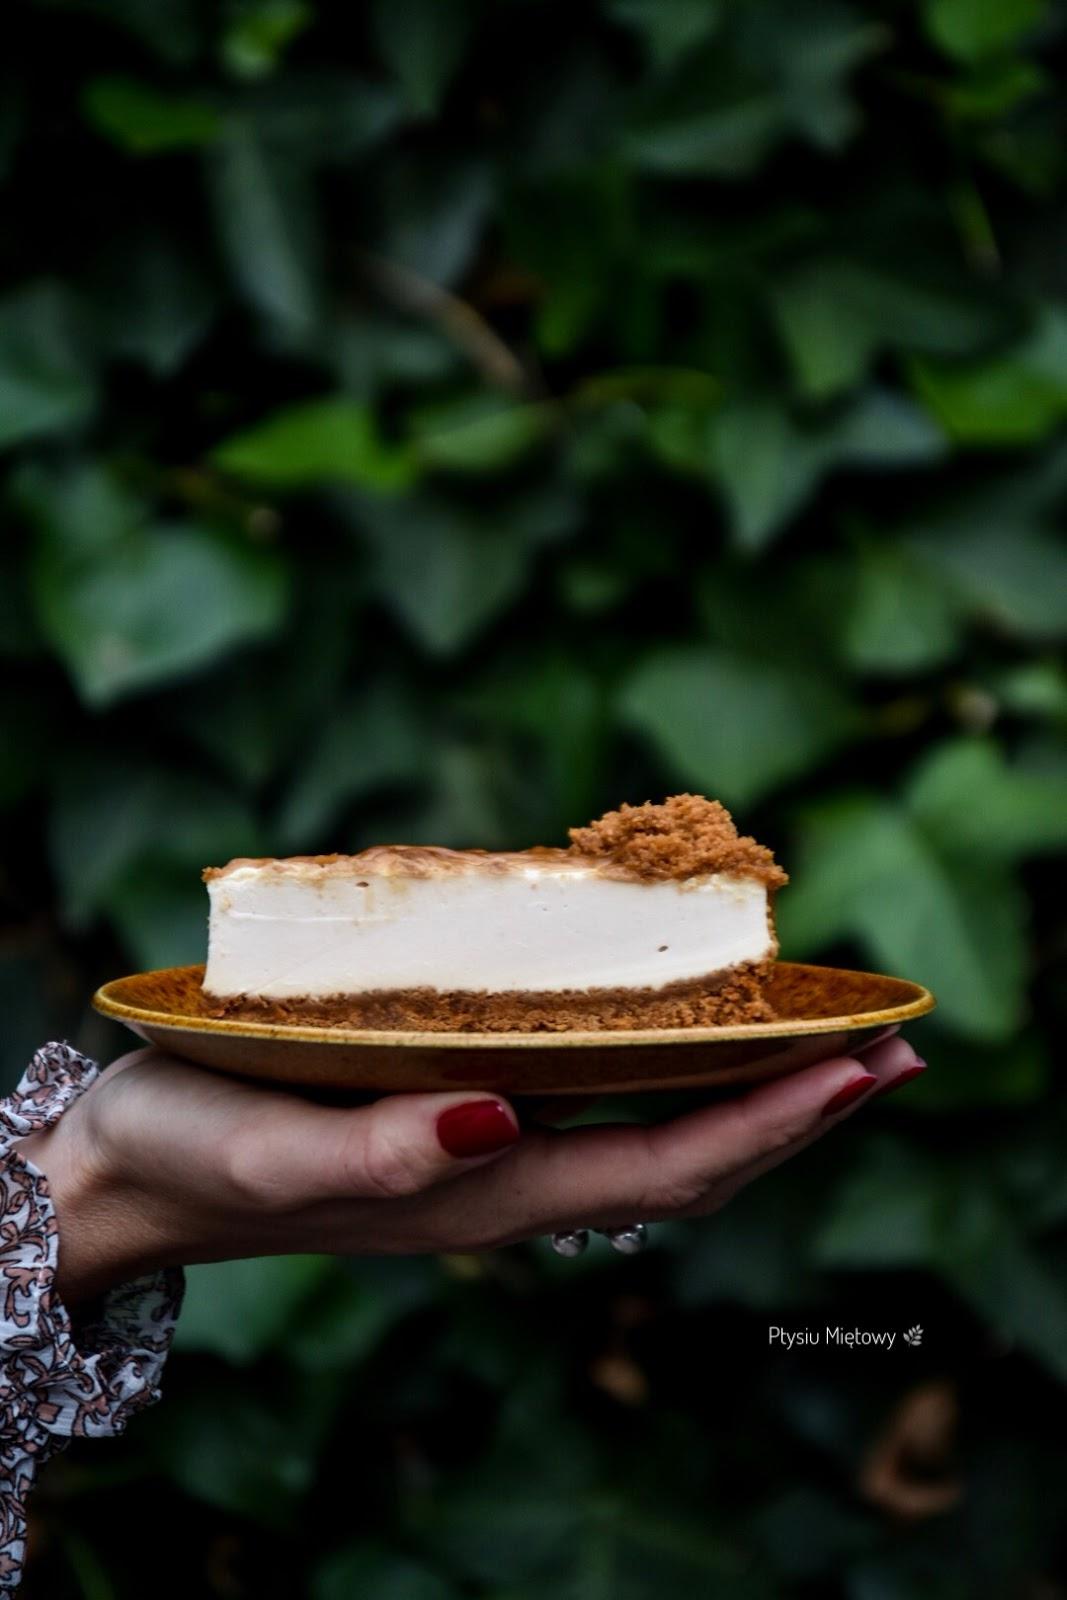 sernik, ciasto, deser, ptysiu mietowy